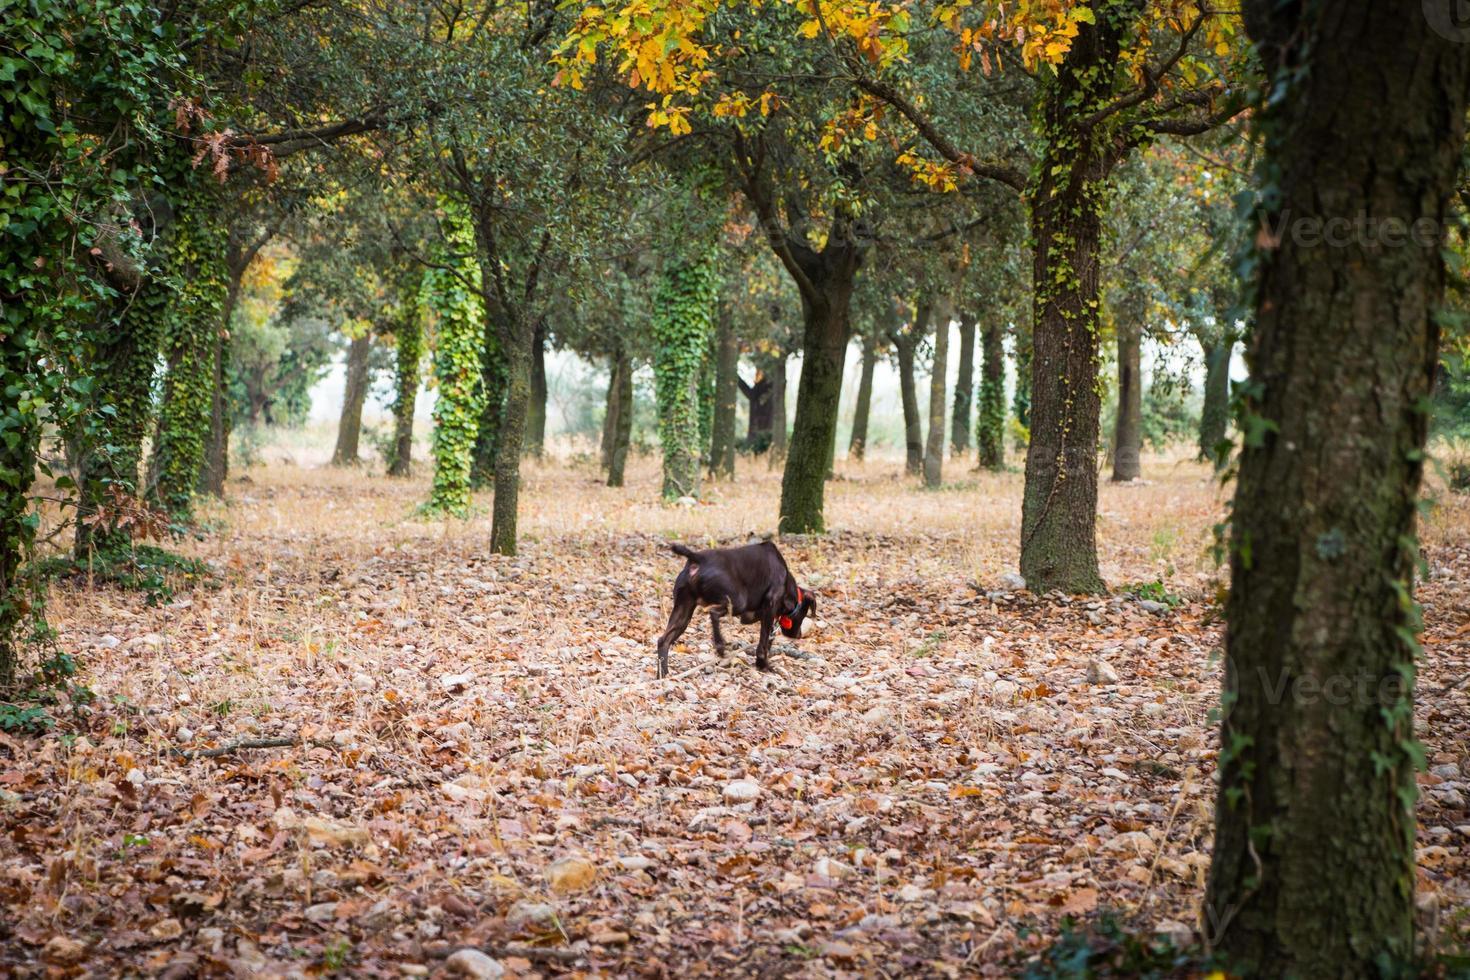 Hundejagd auf Trüffel in der Provence, Frankreich foto